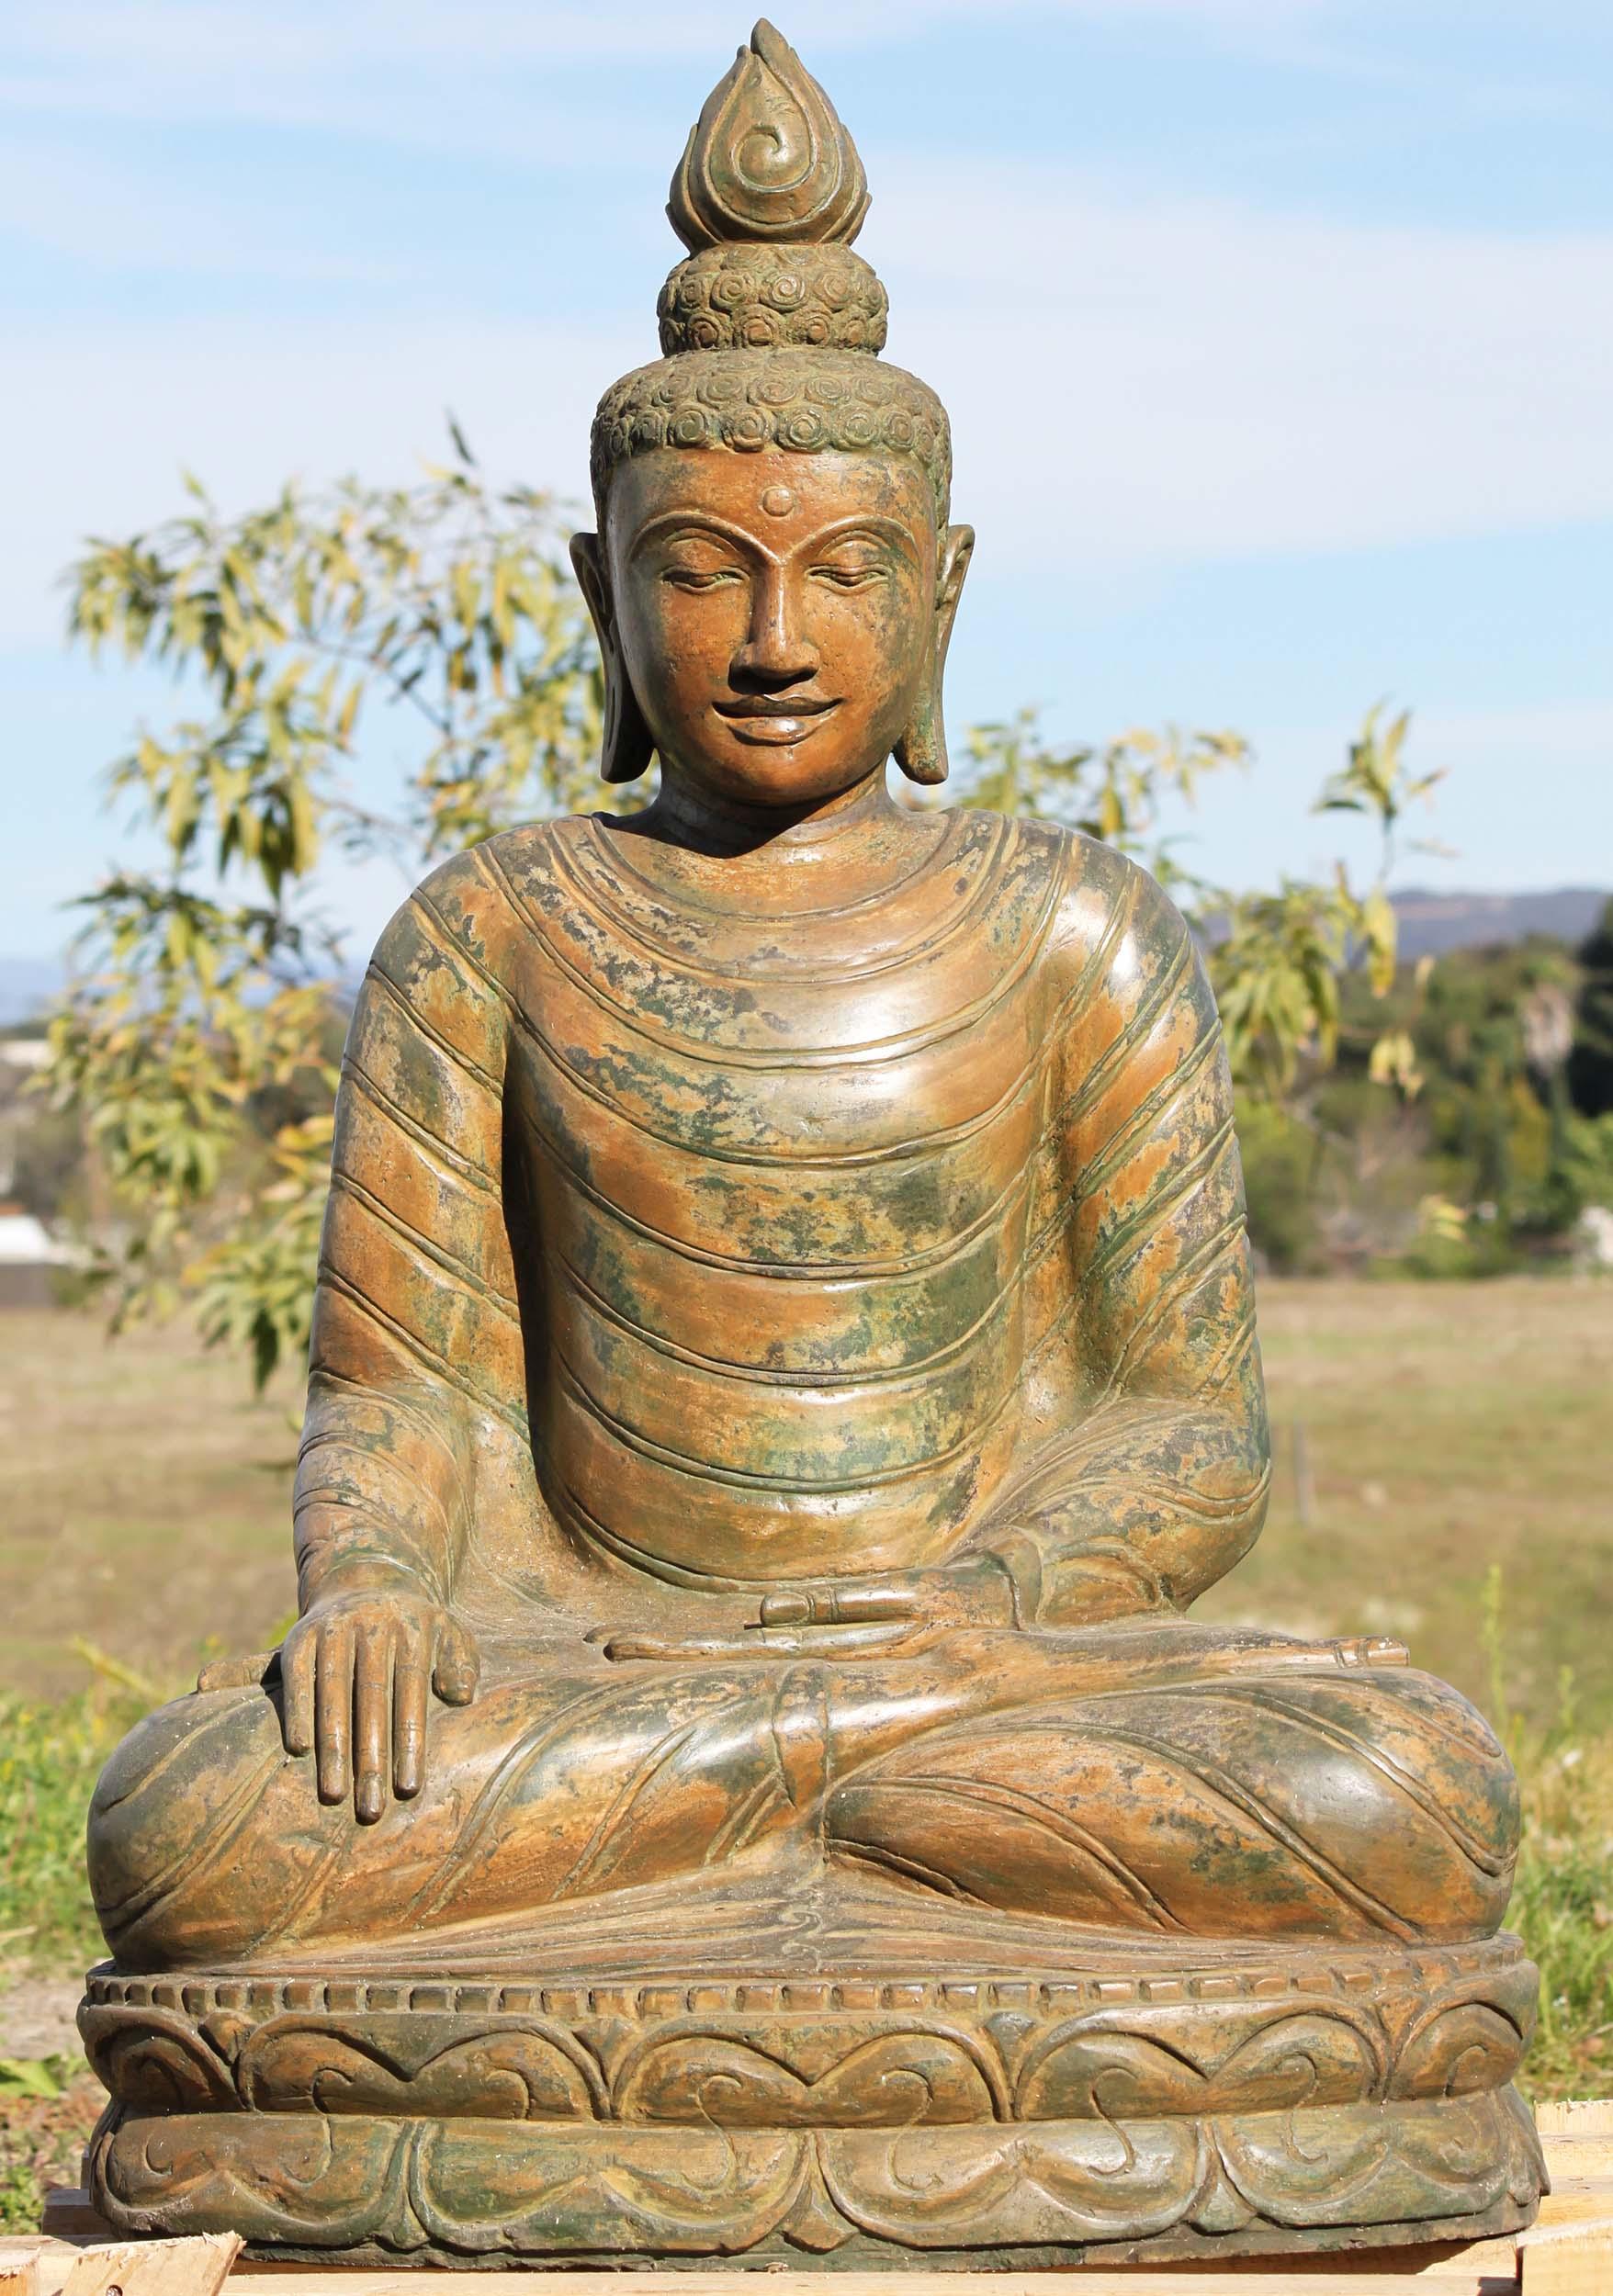 Stone garden earth touching buddha statue 37 105ls434 hindu stone garden earth touching buddha statue 37 workwithnaturefo